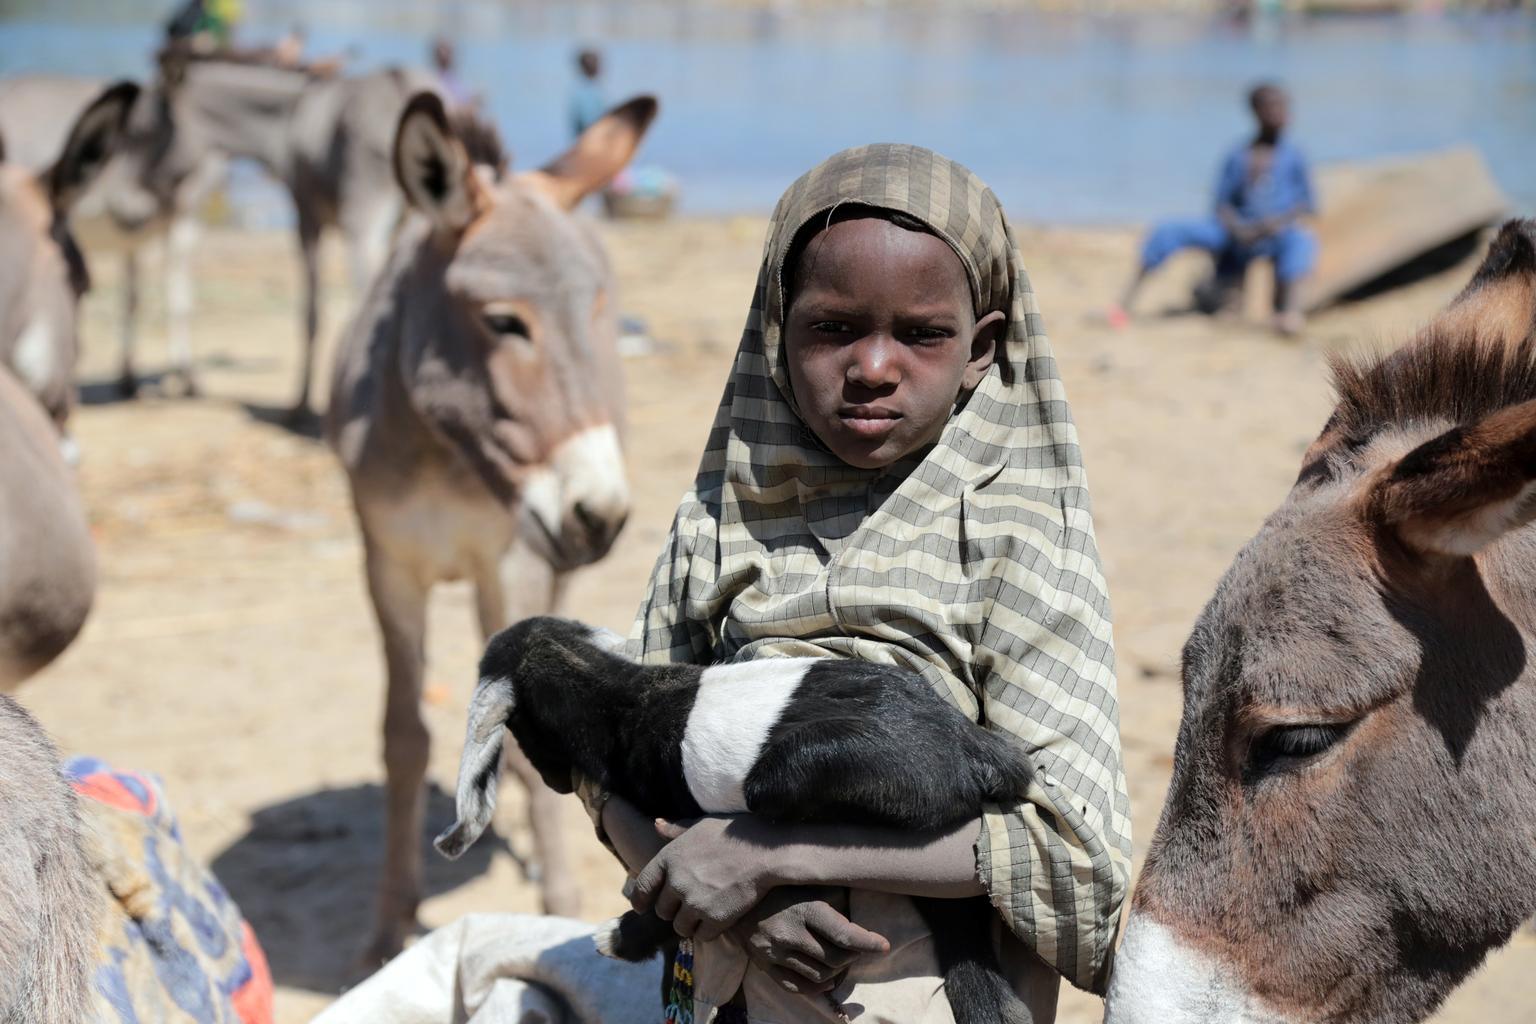 UNICEF/NYHQ2015-0123/Moreno